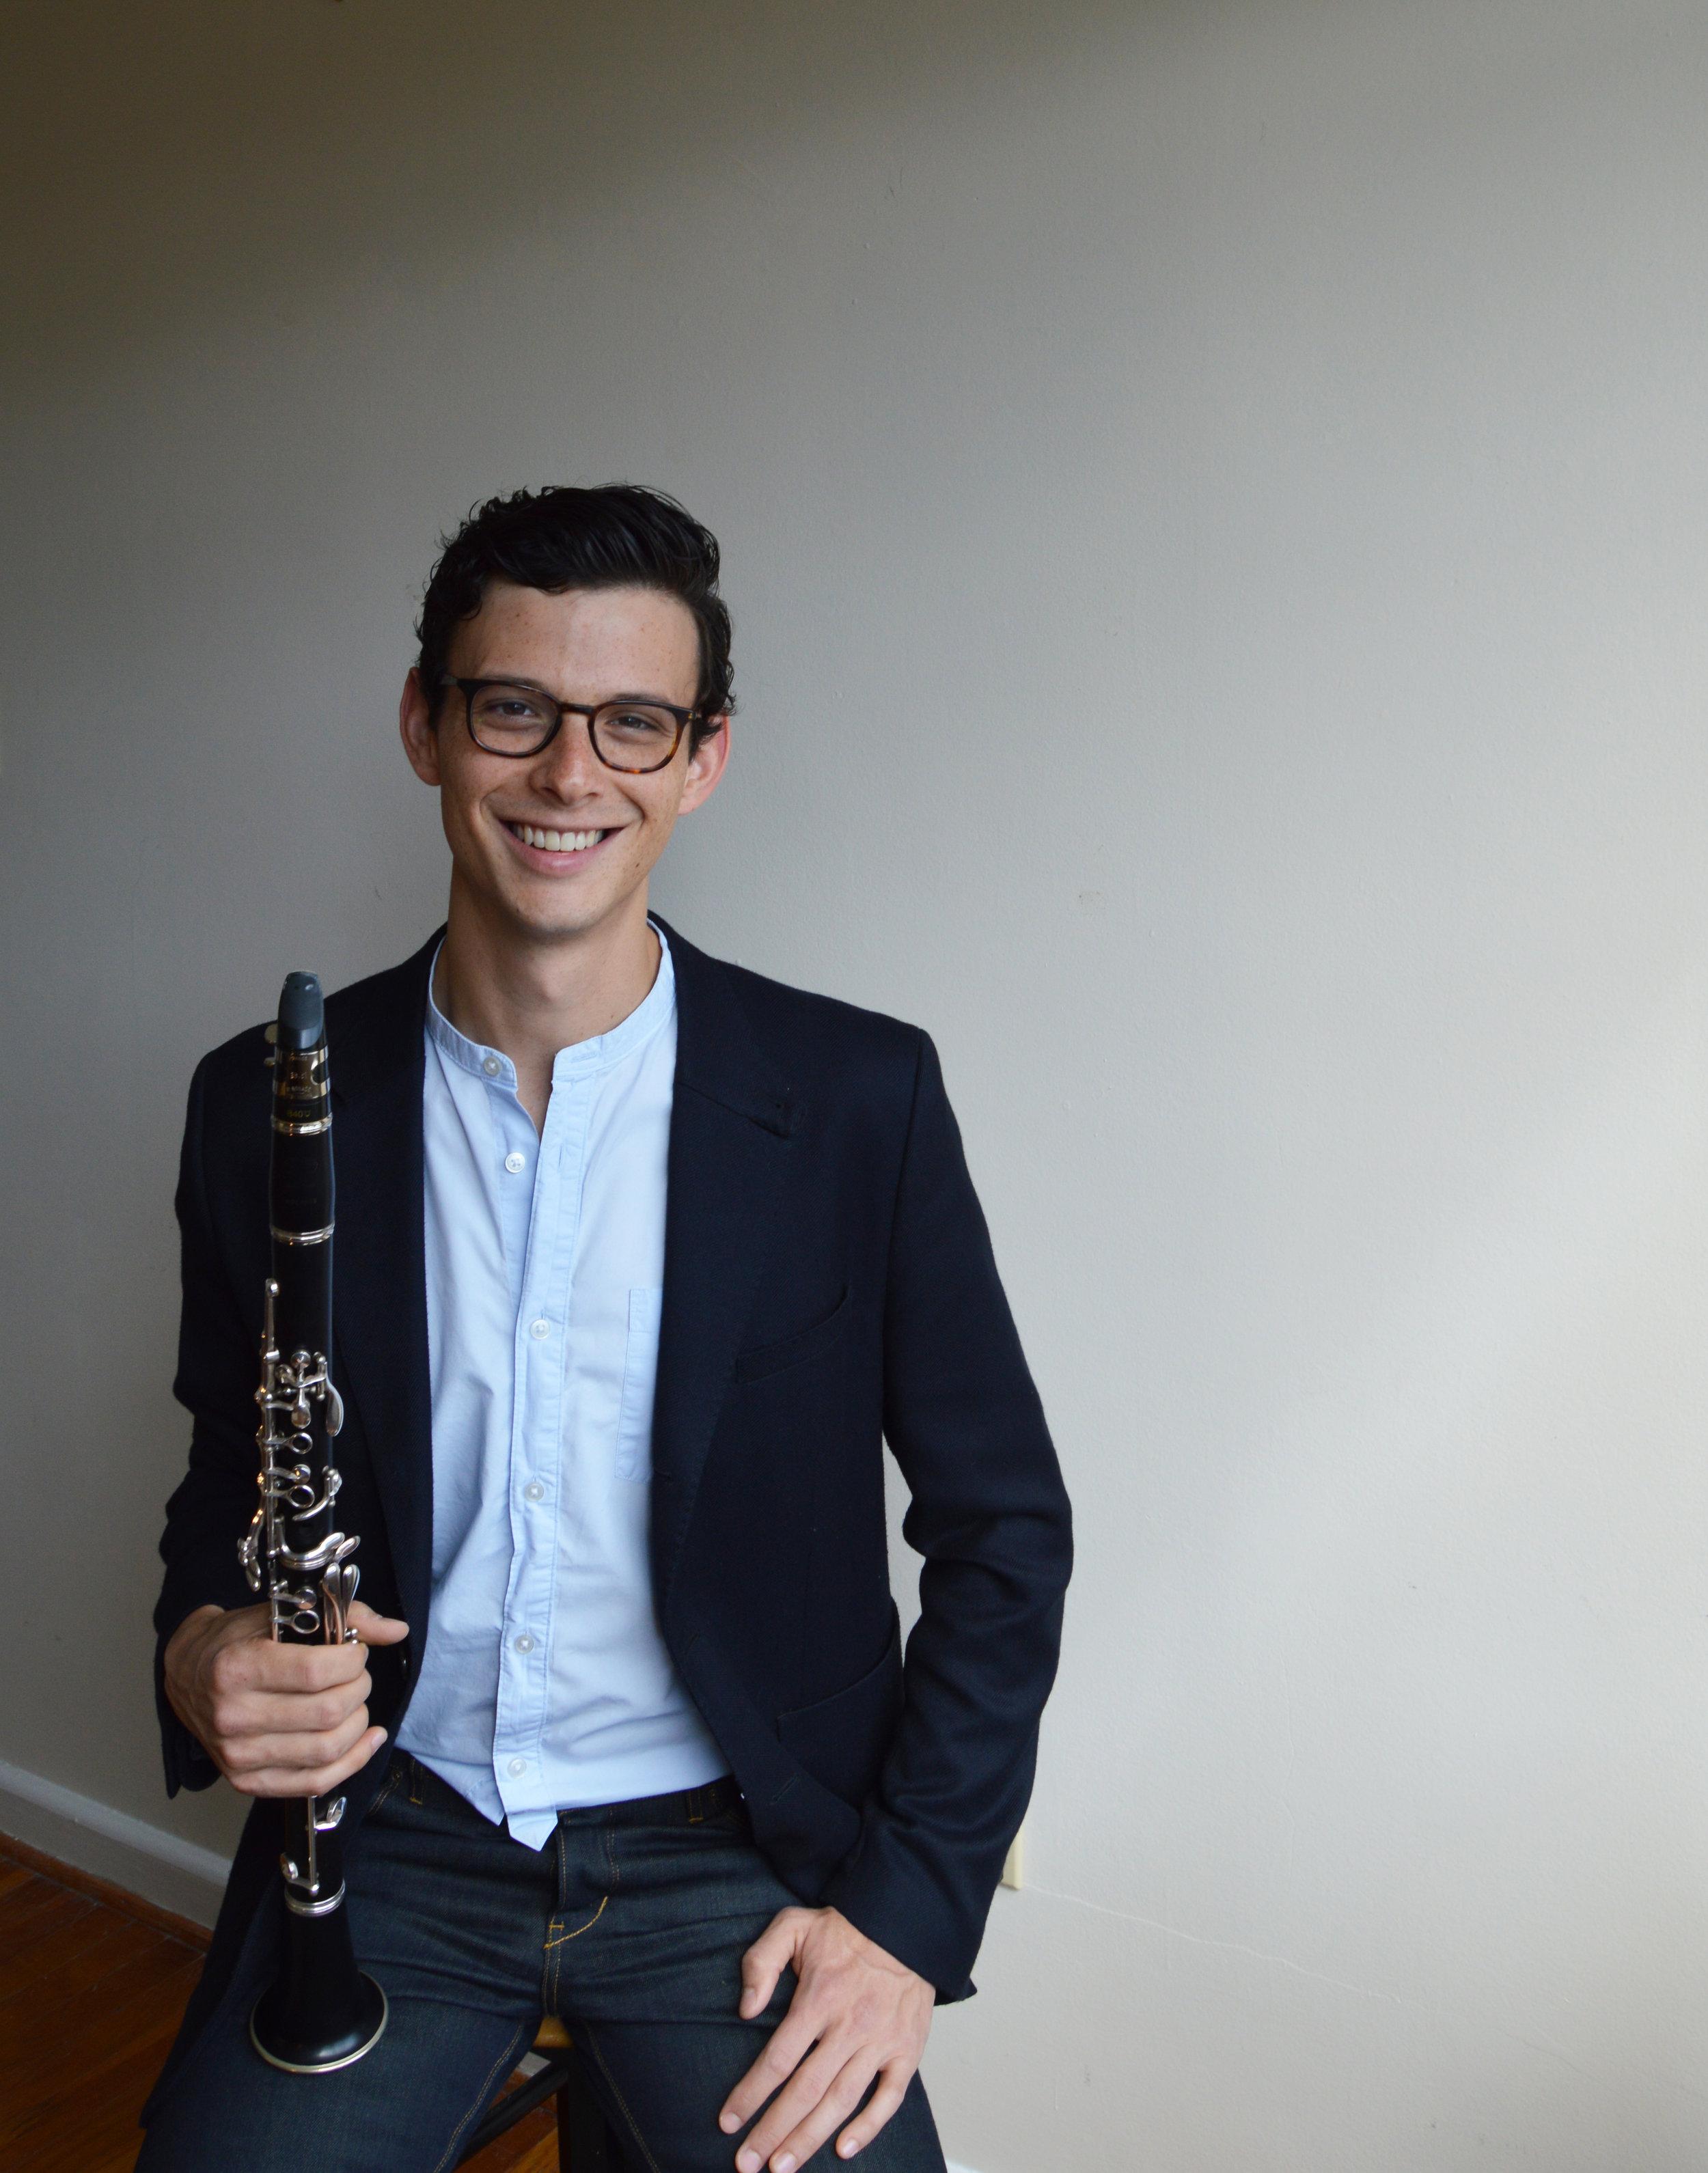 Samuel Almaguer, clarinet